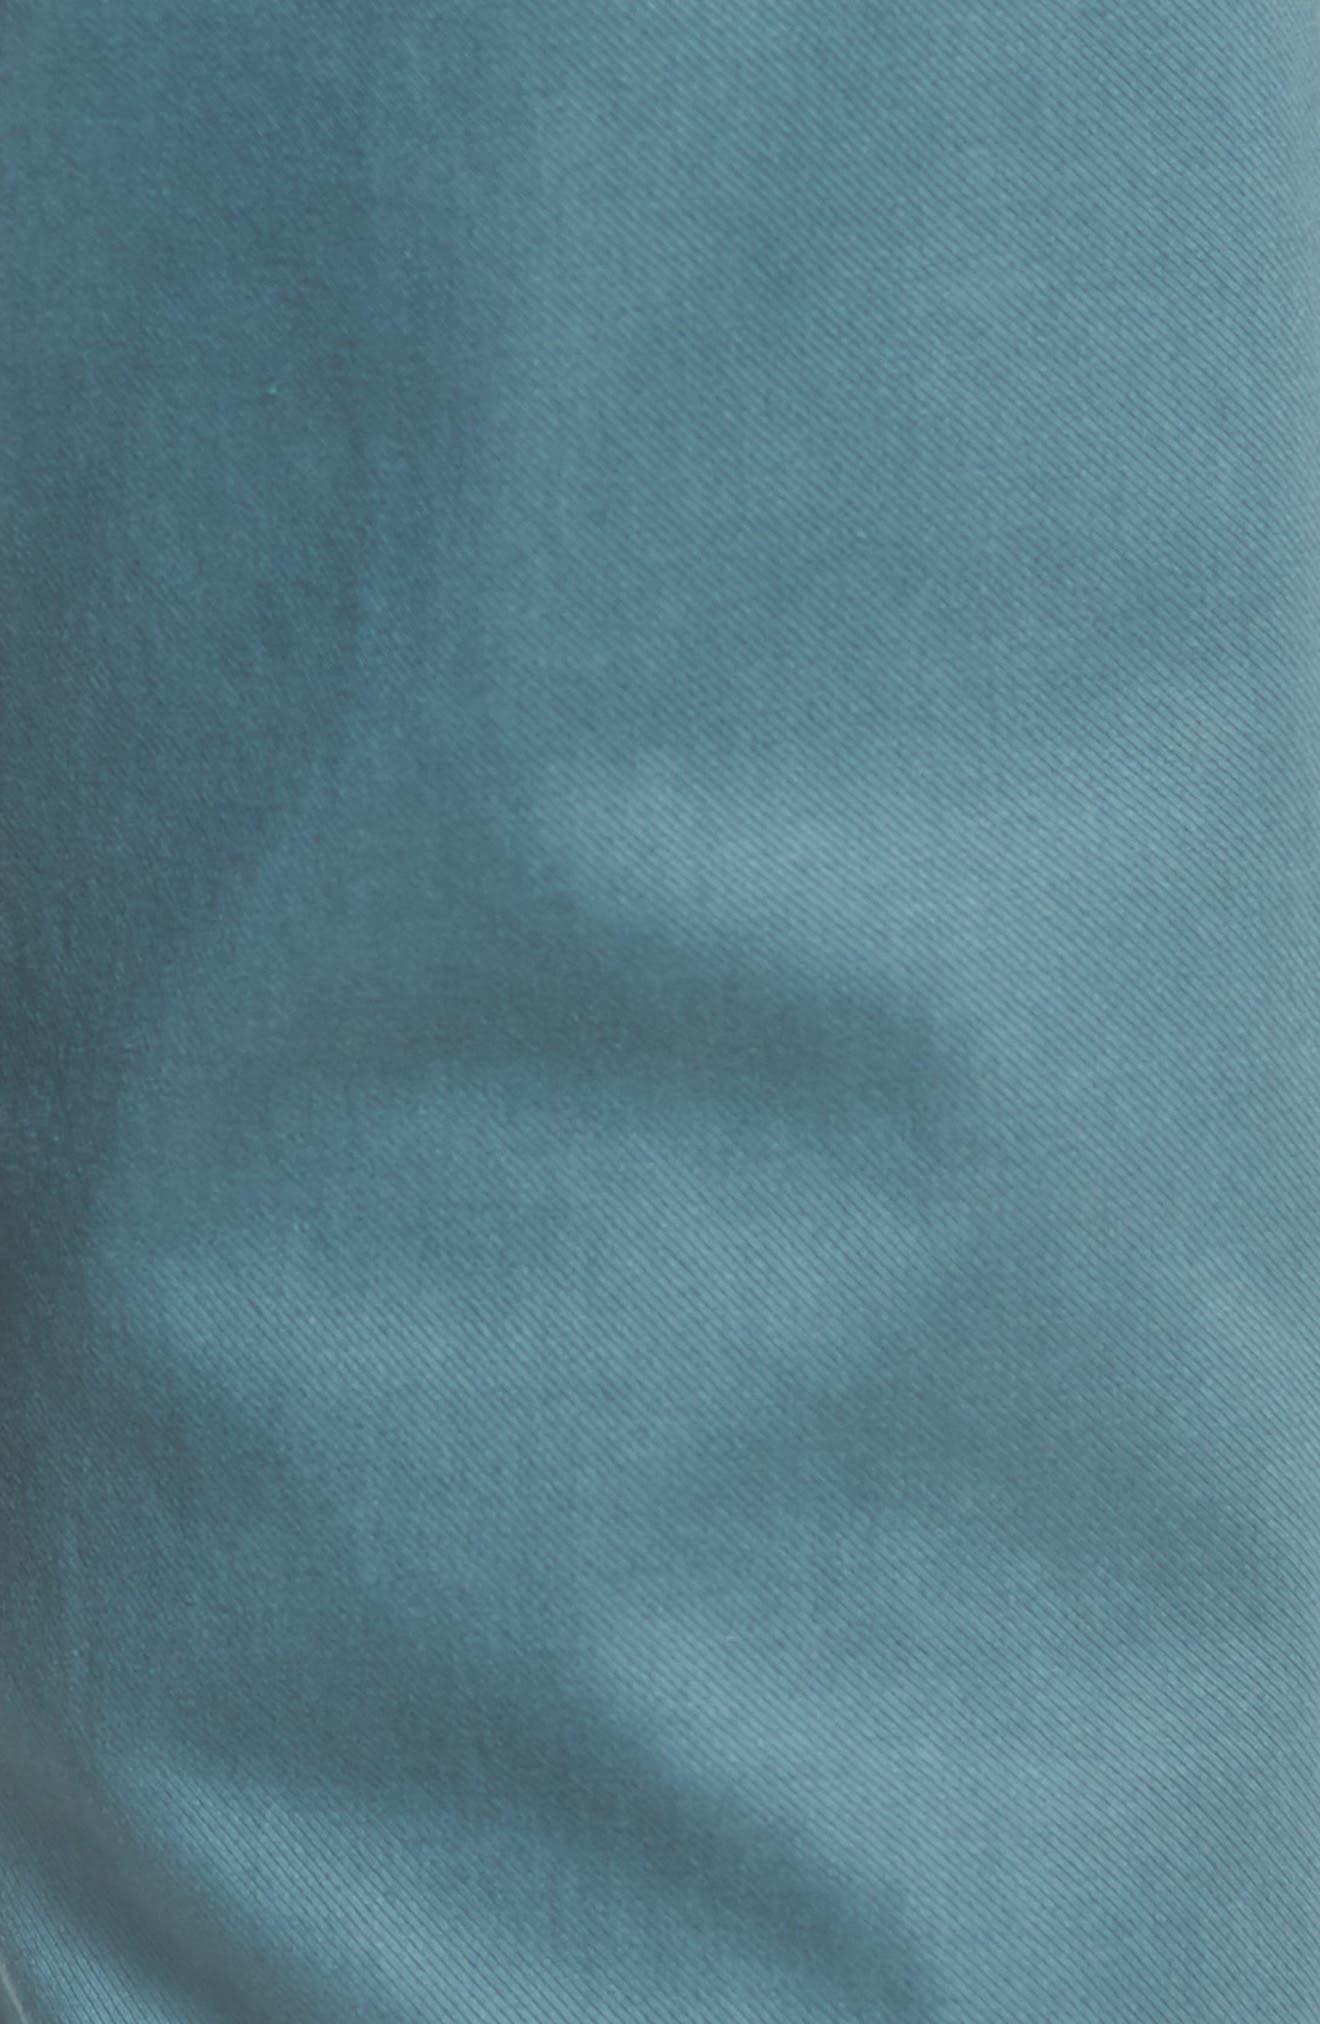 Blake Slim Fit Jeans,                             Alternate thumbnail 5, color,                             Ocean